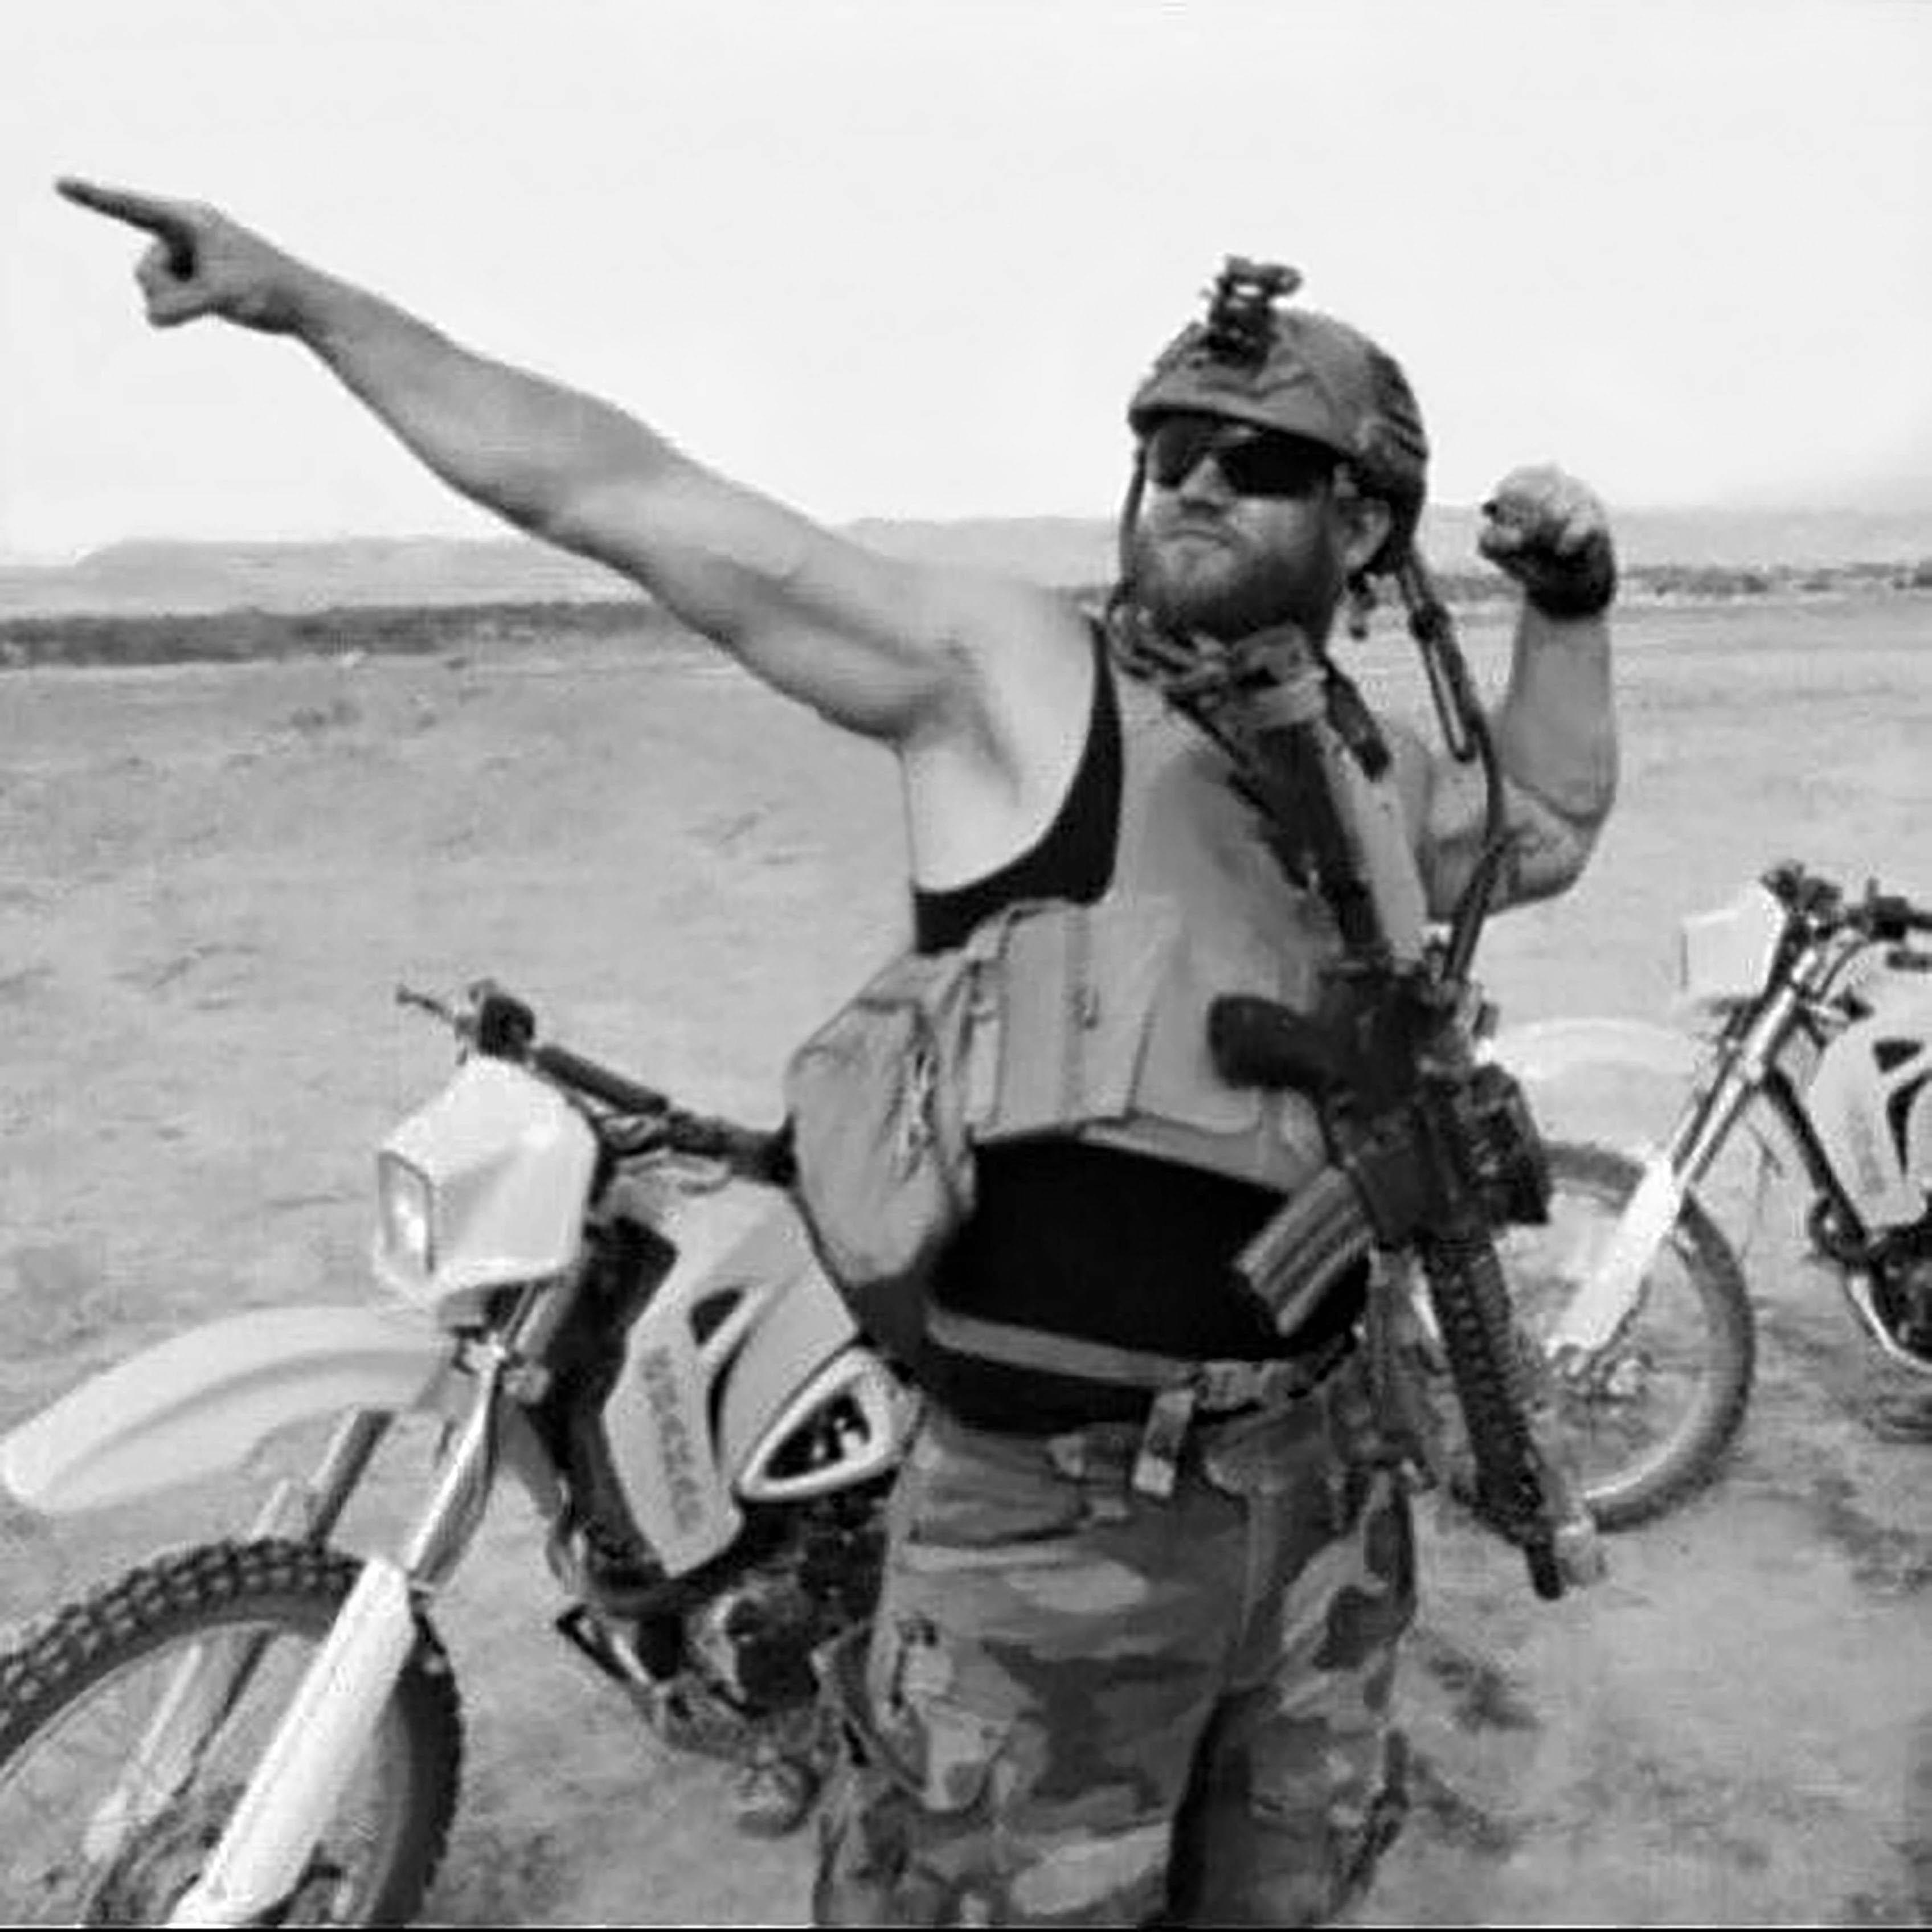 Justin.2 bikes